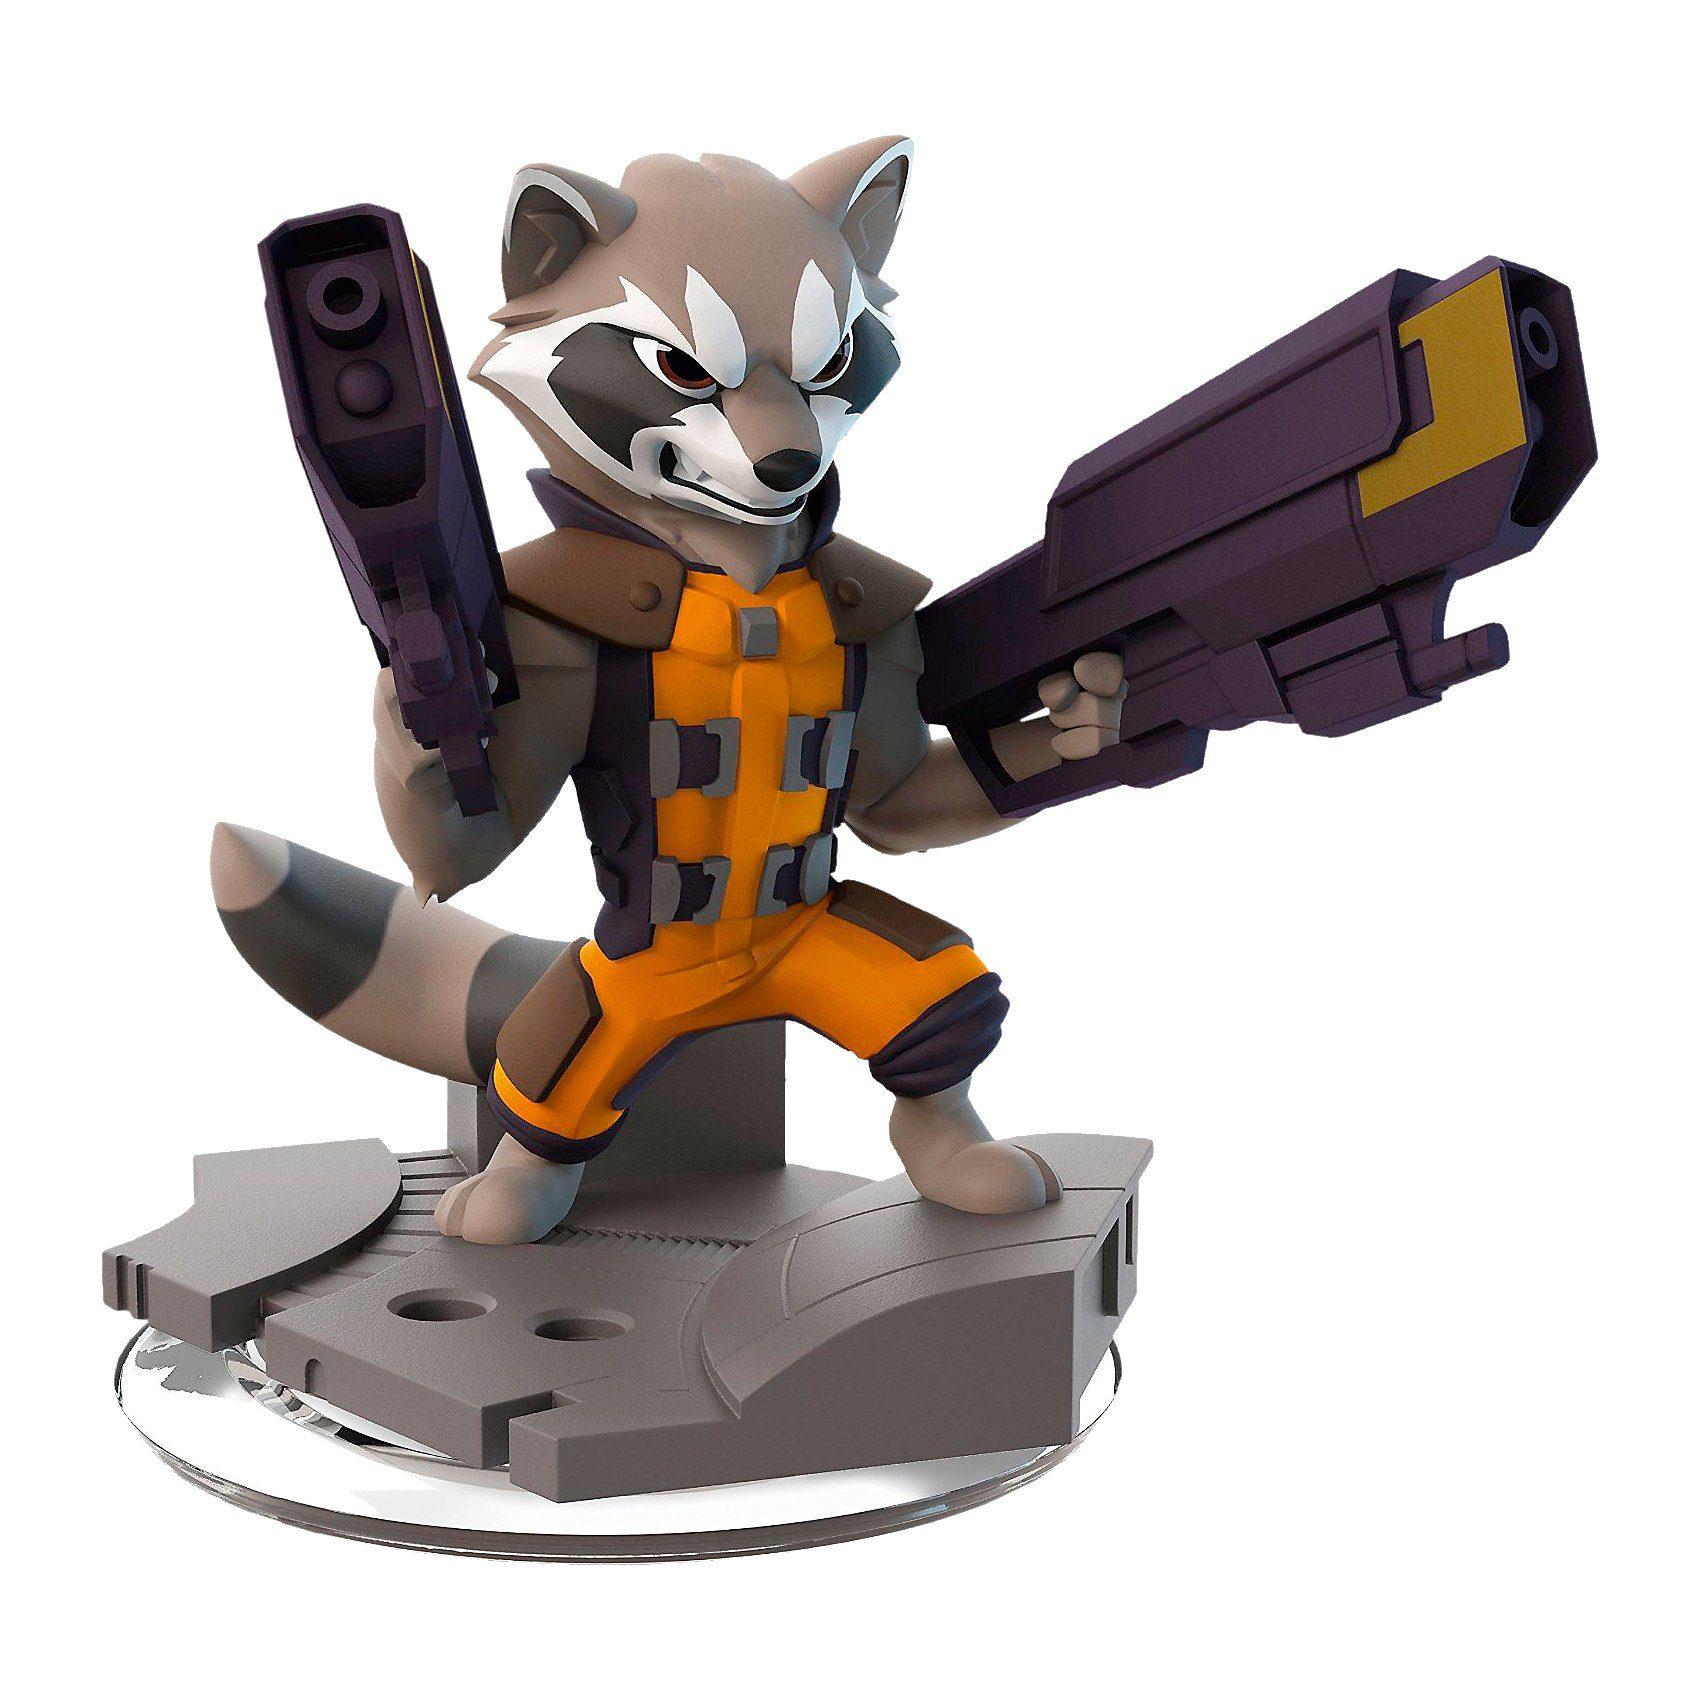 ak tronic Disney Infinity 2.0: Einzelfigur Rocket Raccoon